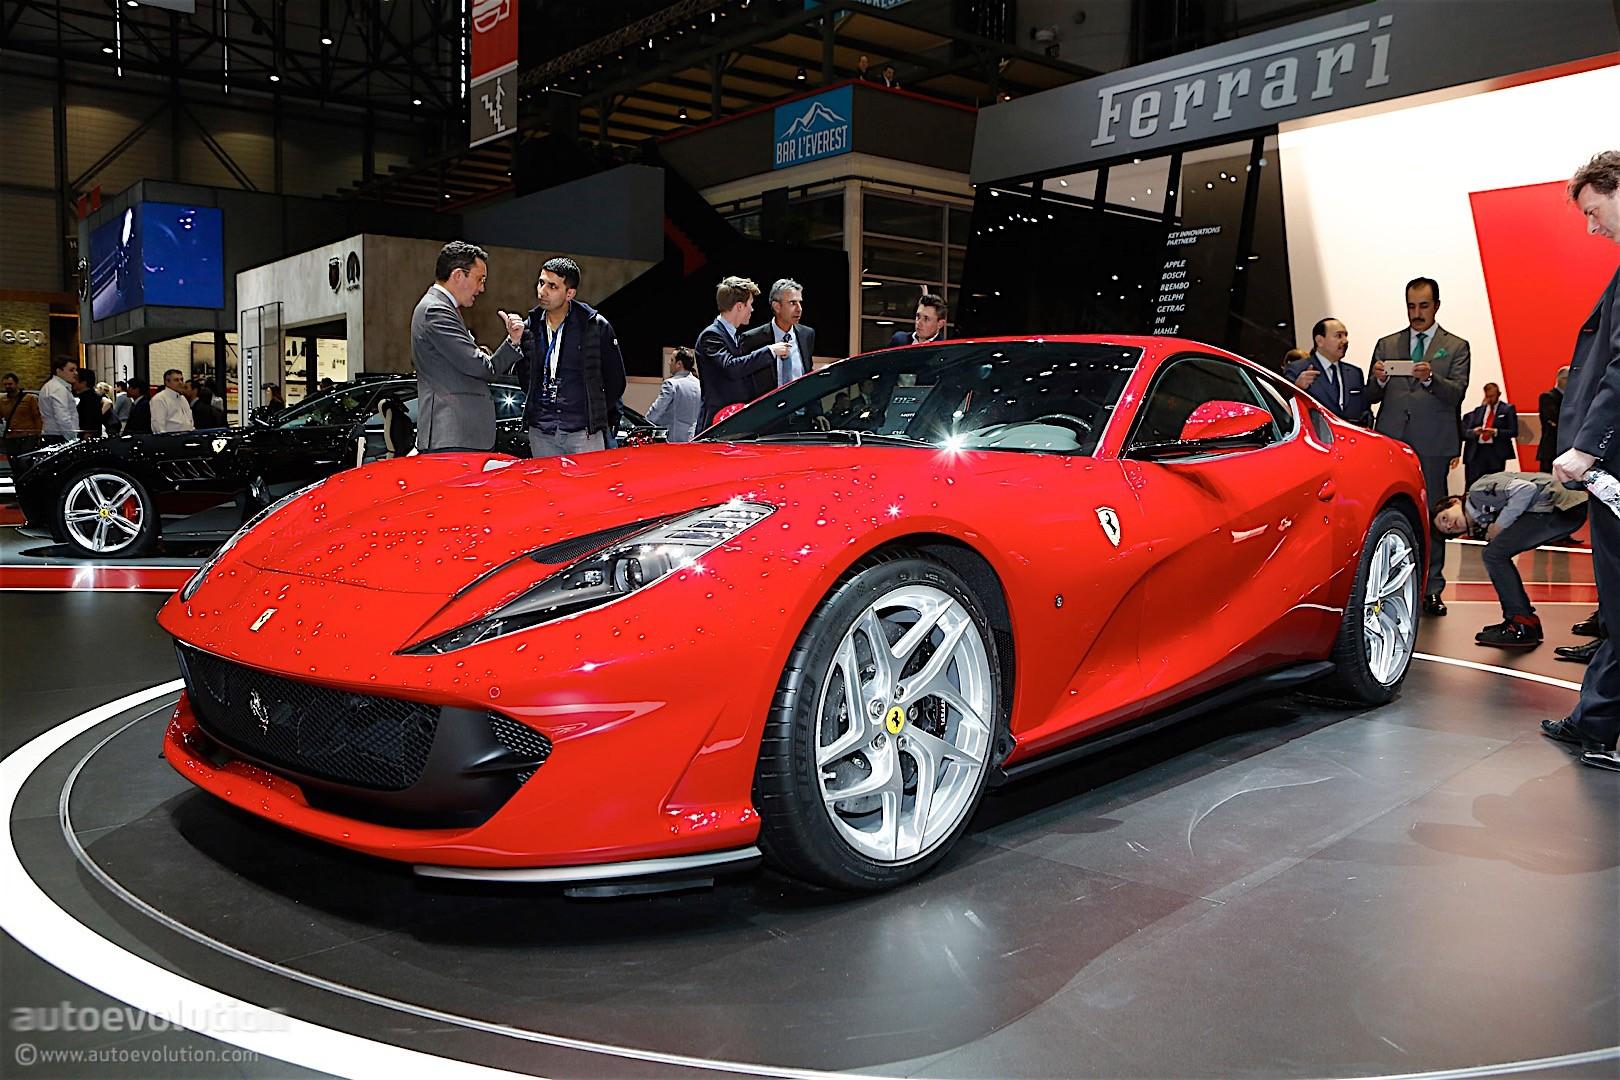 Ferrari 812 Superfast Aero, Engine and Dynamics Detailed ...